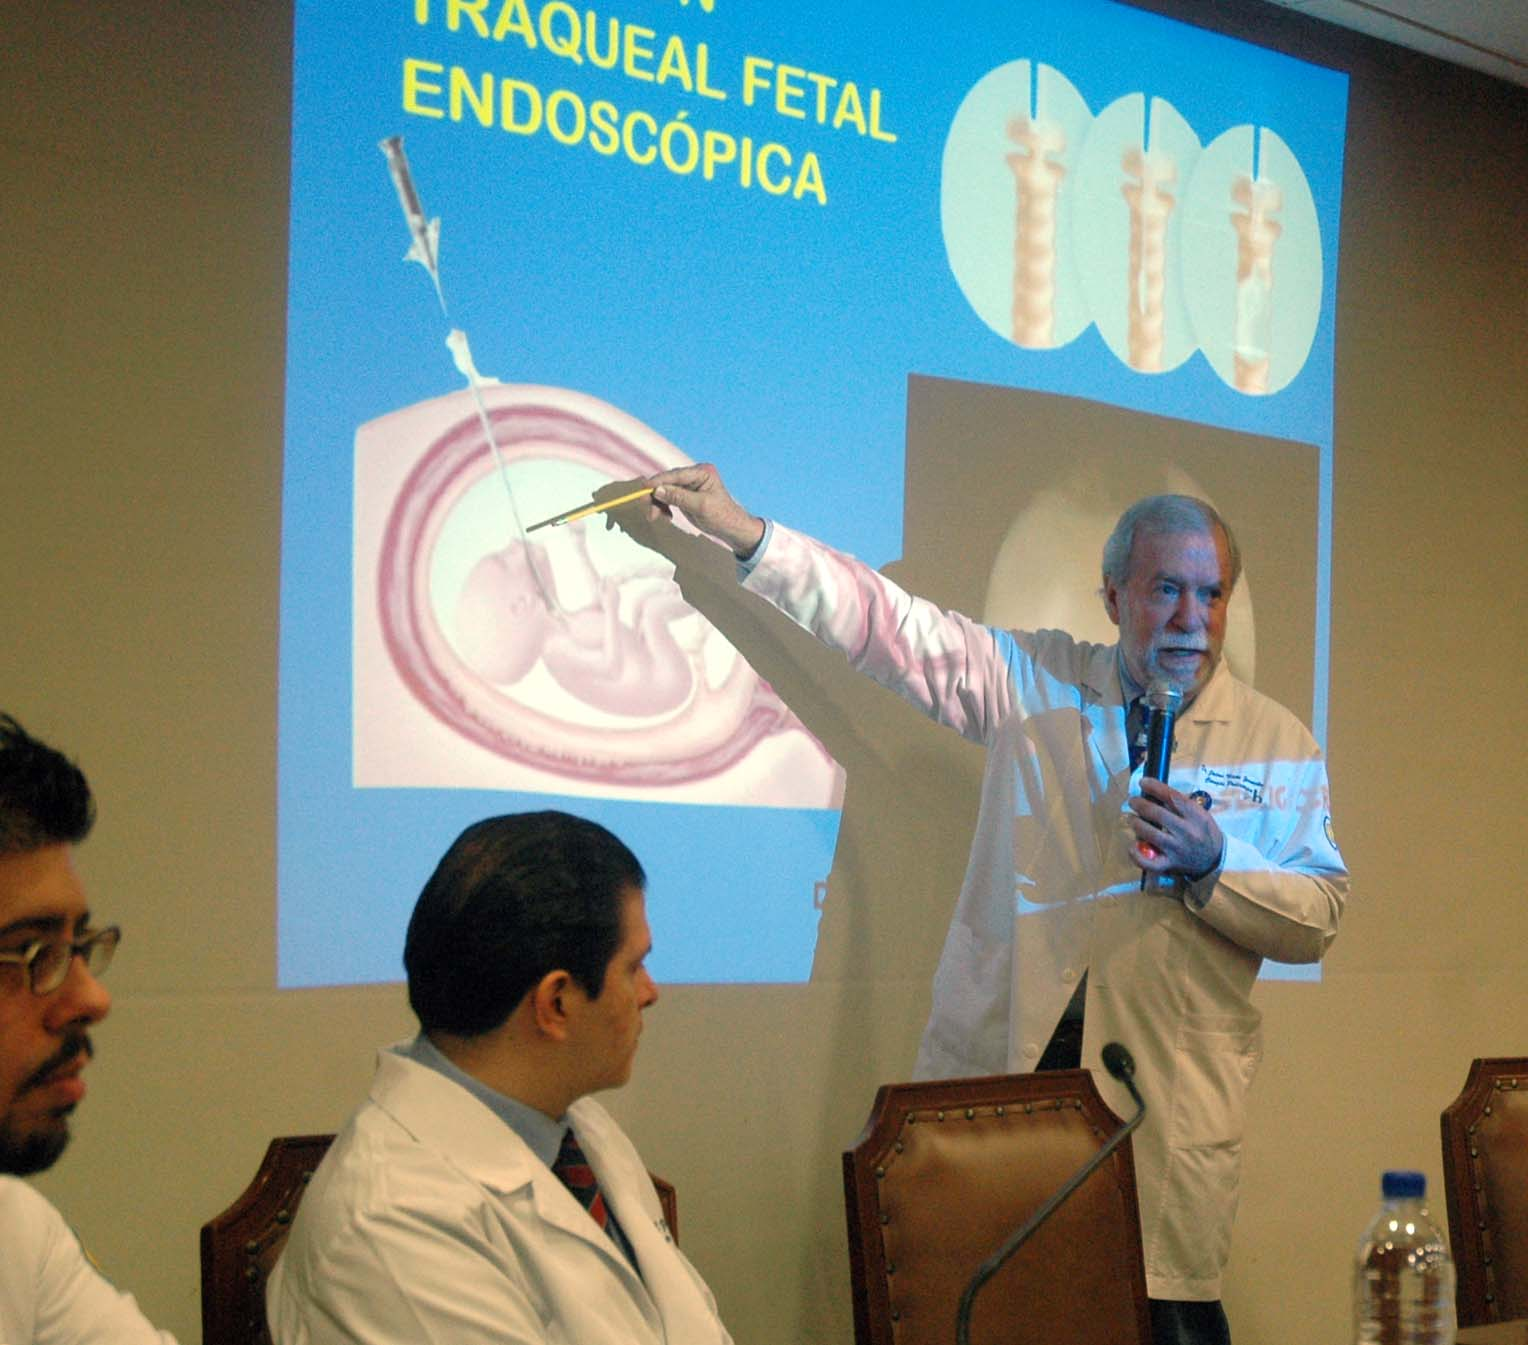 280615 Cirugia Fetal 03jpg